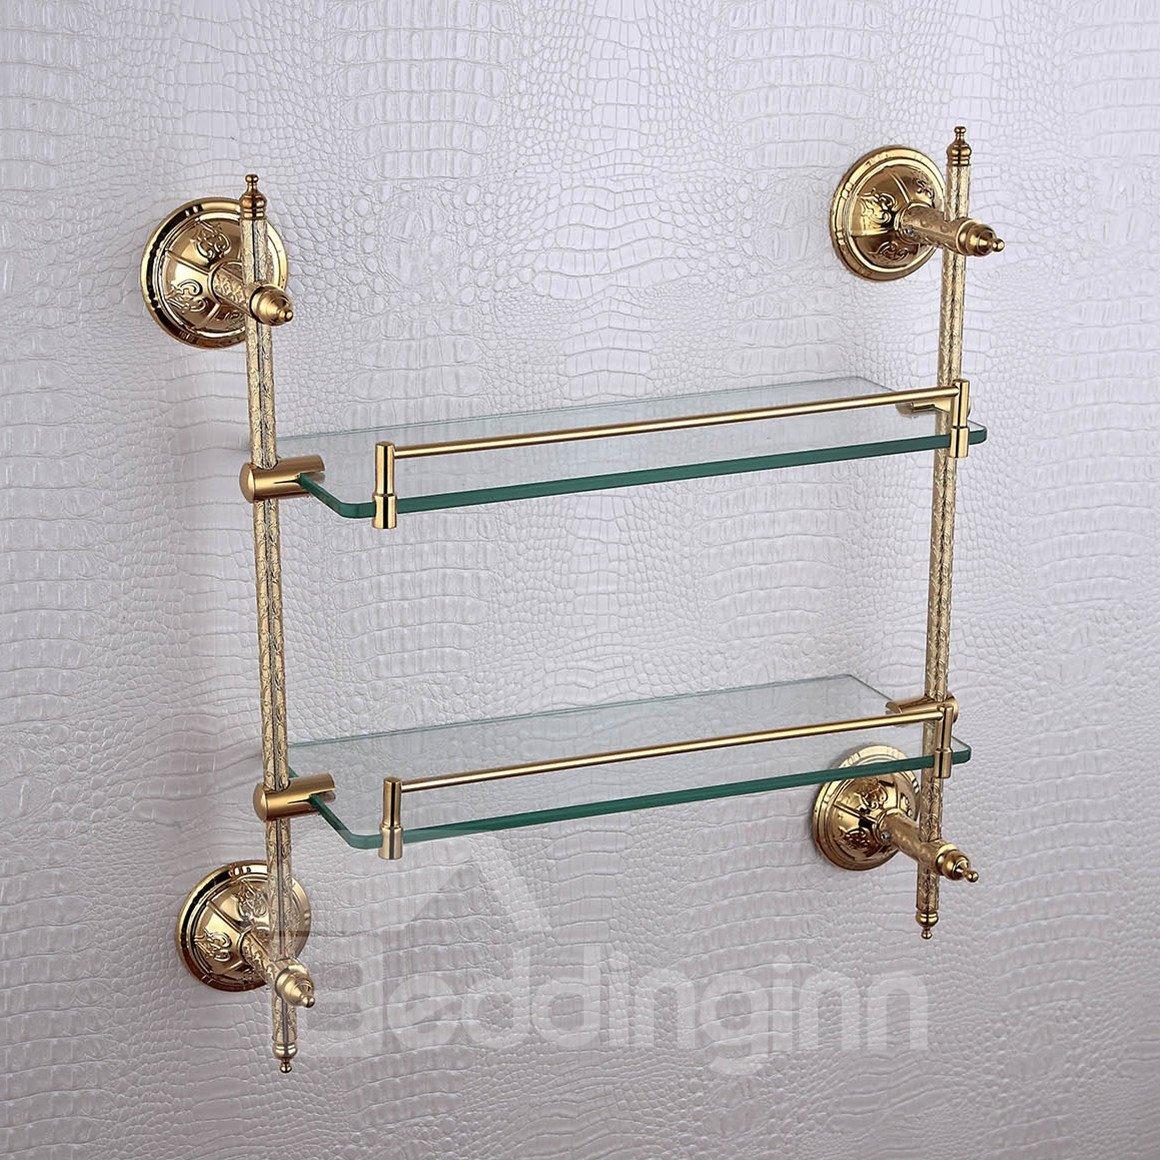 Double layer glass bracket,Brass,Golden finish